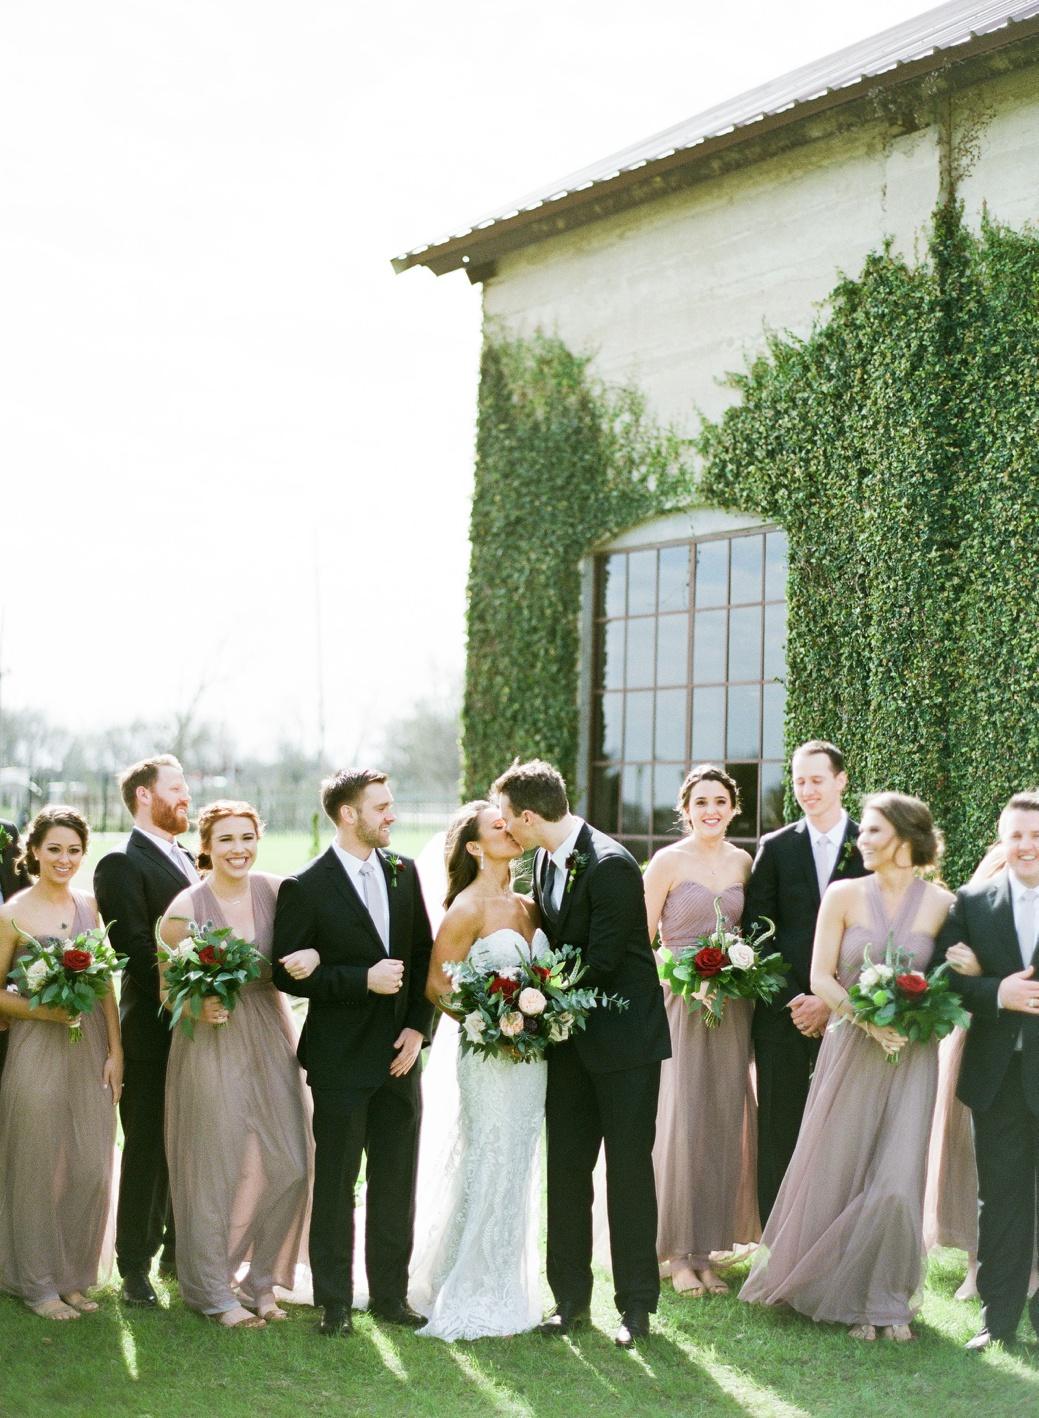 Olde-Dobbin-Station-Wedding-Photographer-Kelly-34